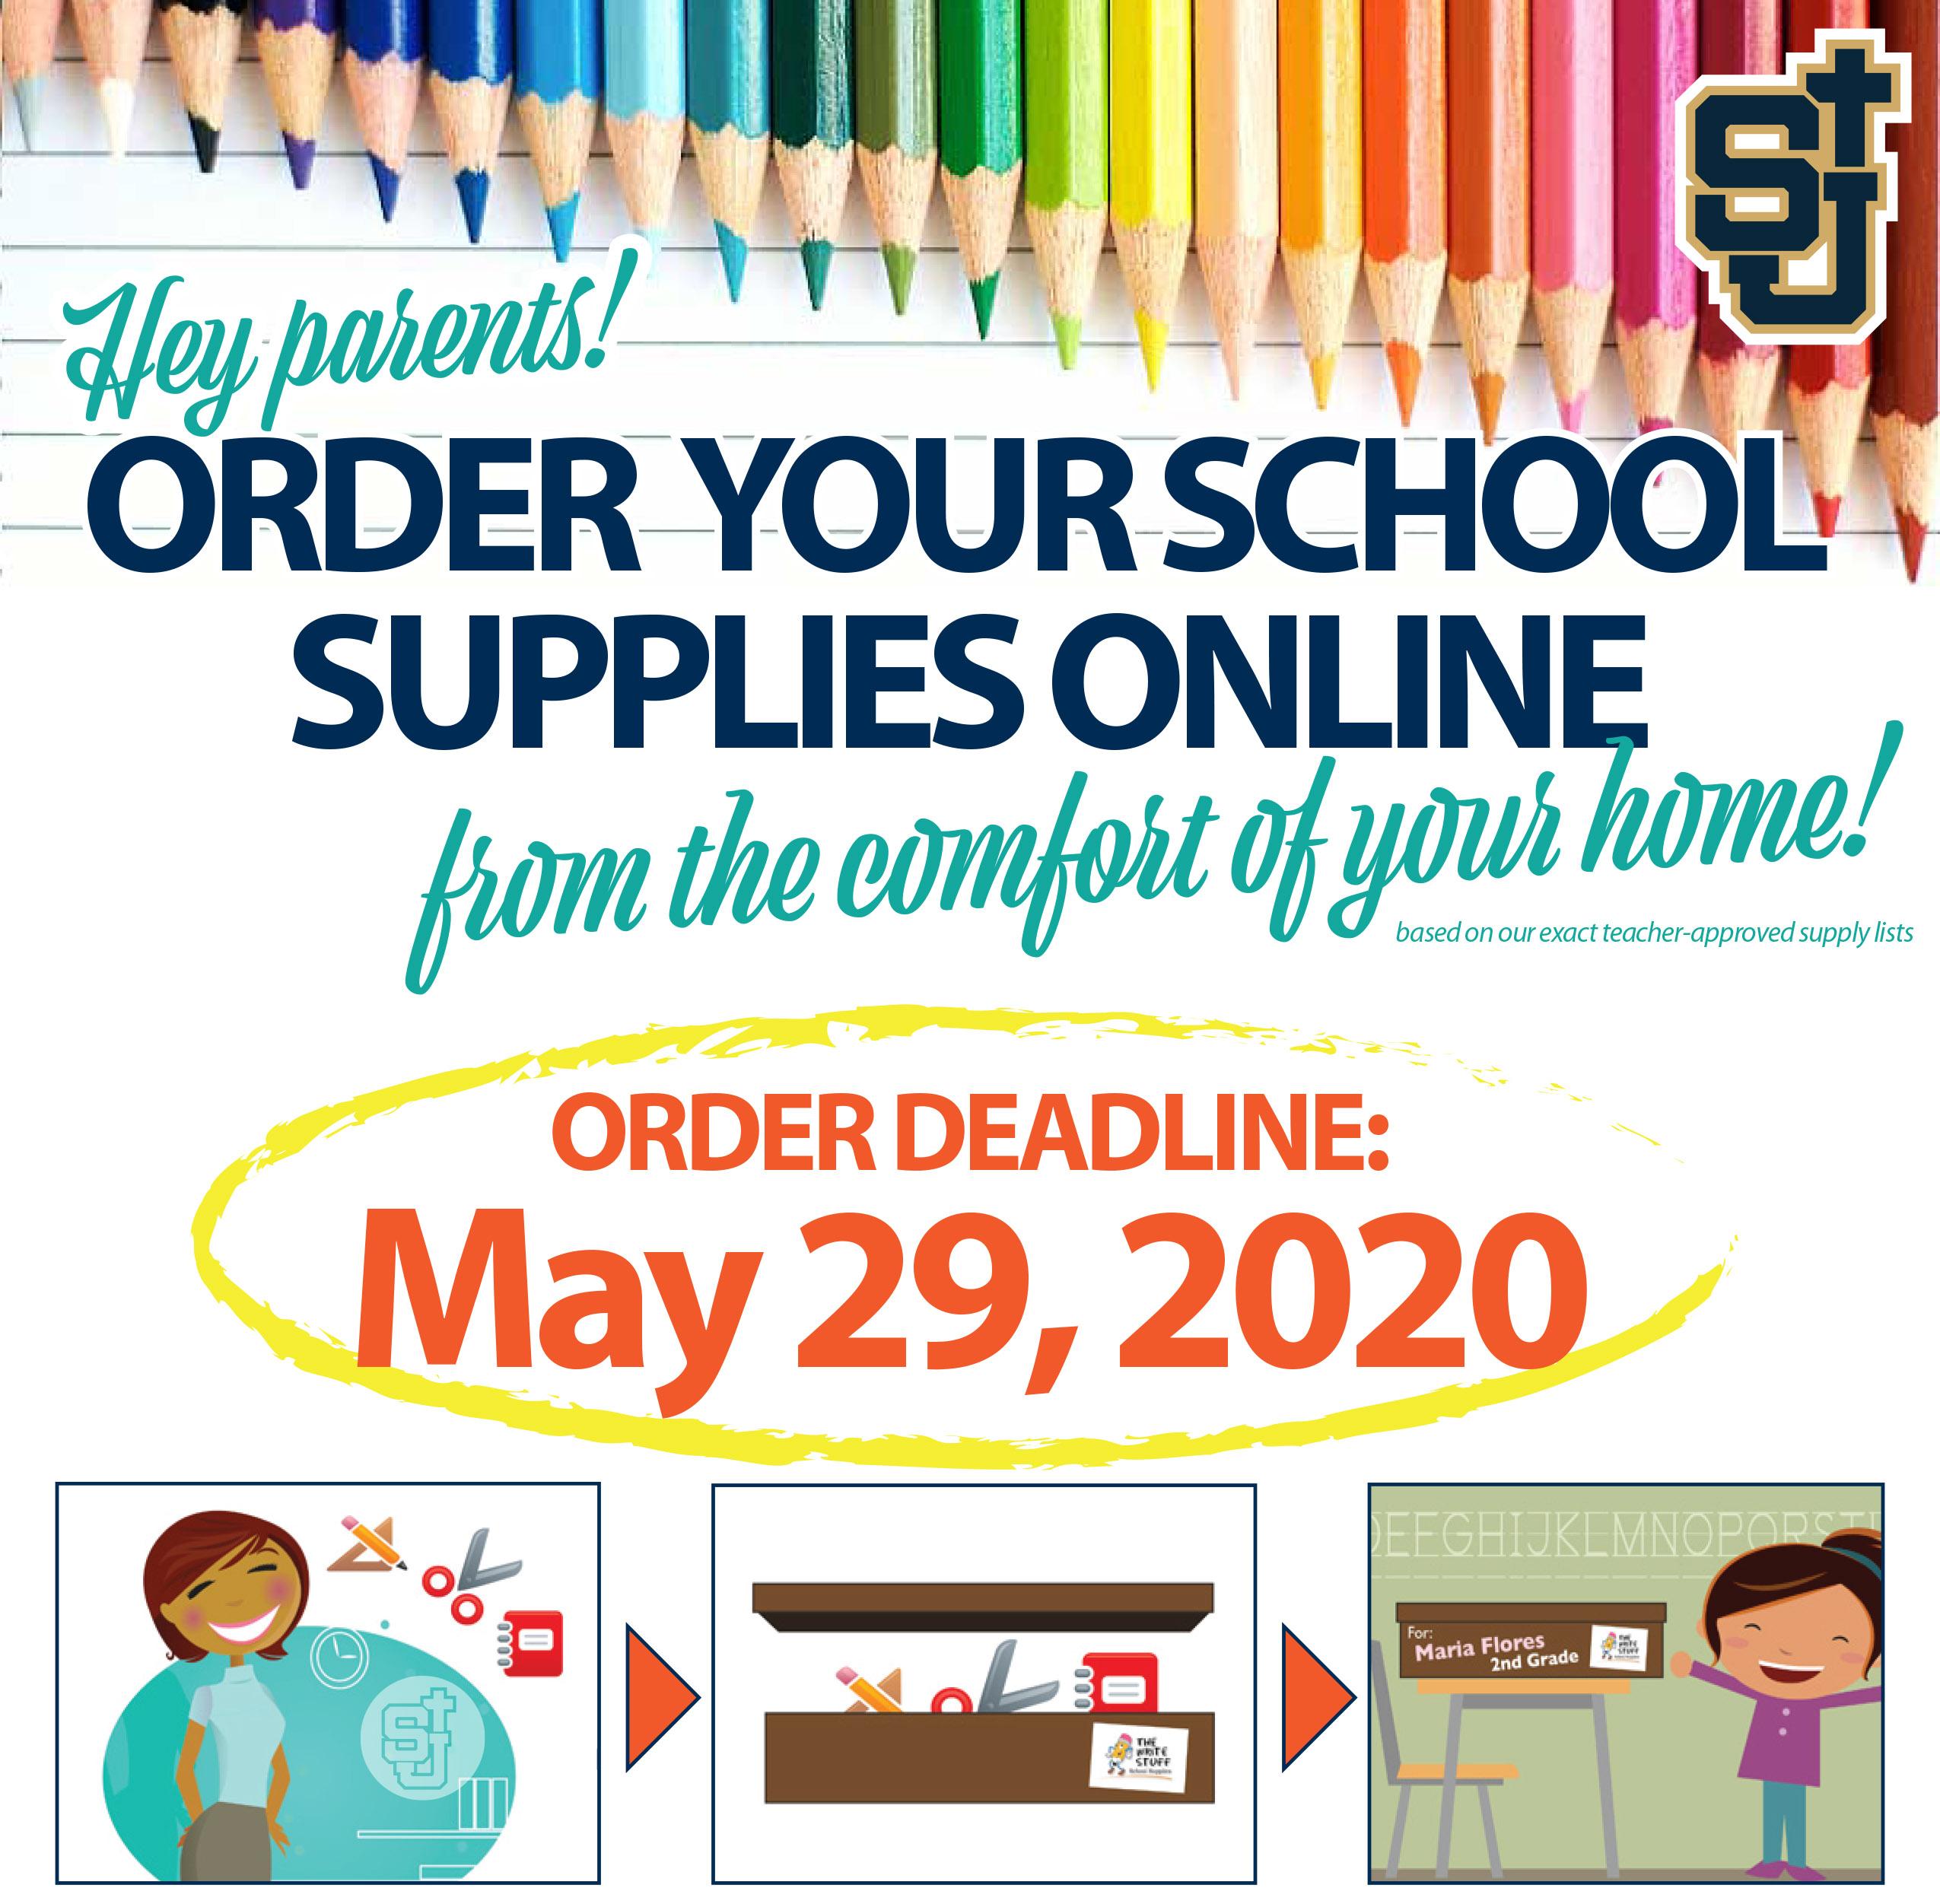 School Supplies Picture Christian Academy in Orange CA